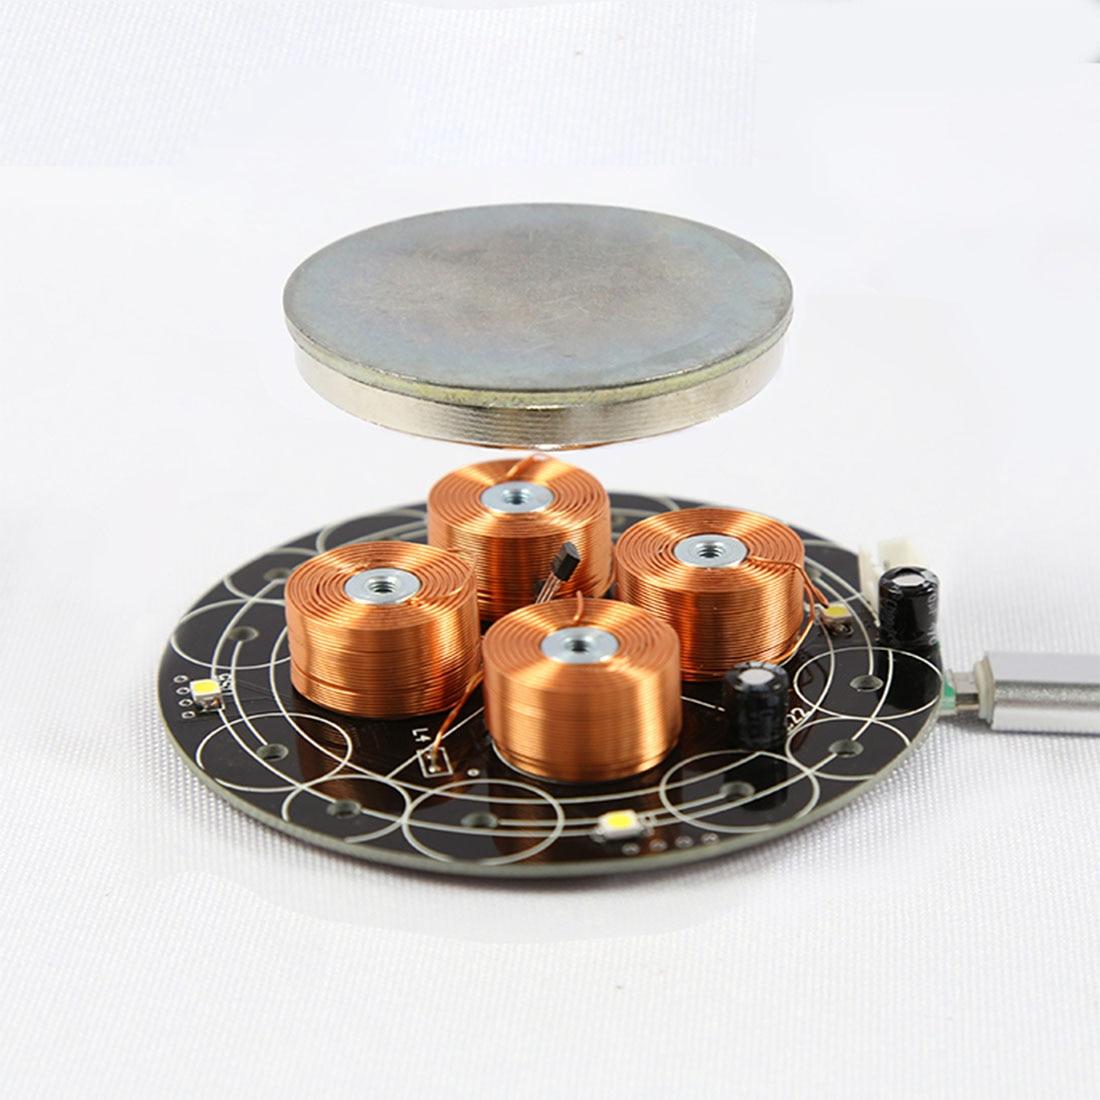 New Hot 1pcs Magnetic Levitation Module DIY Maglev Furnishing Articles Kit Load-Bearing 150g 300g 500g